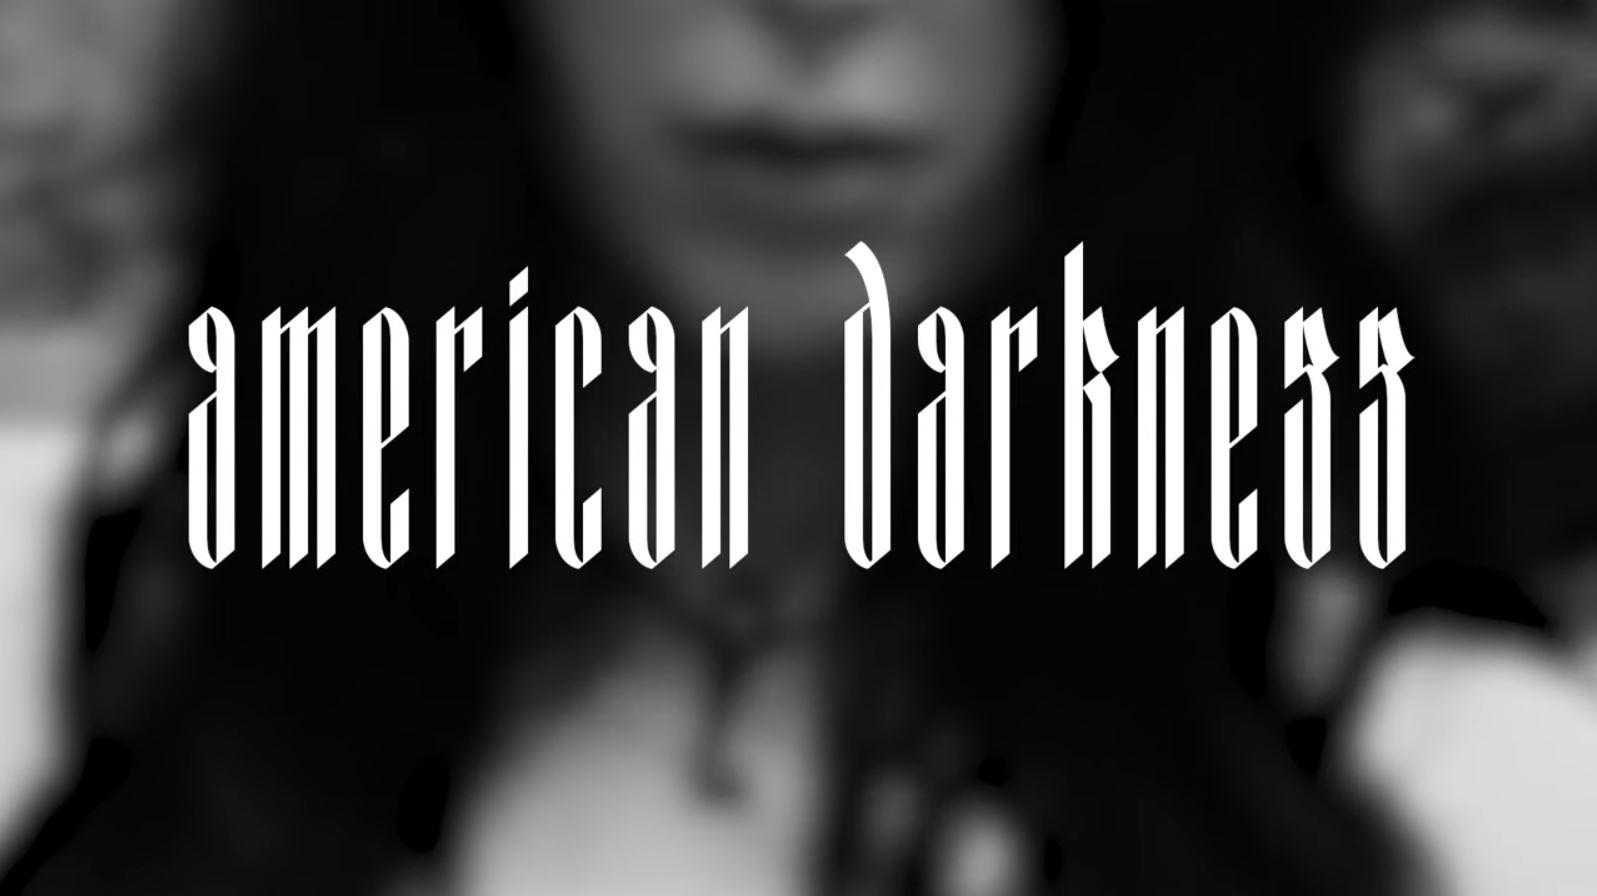 chelsea wolfe american darkness